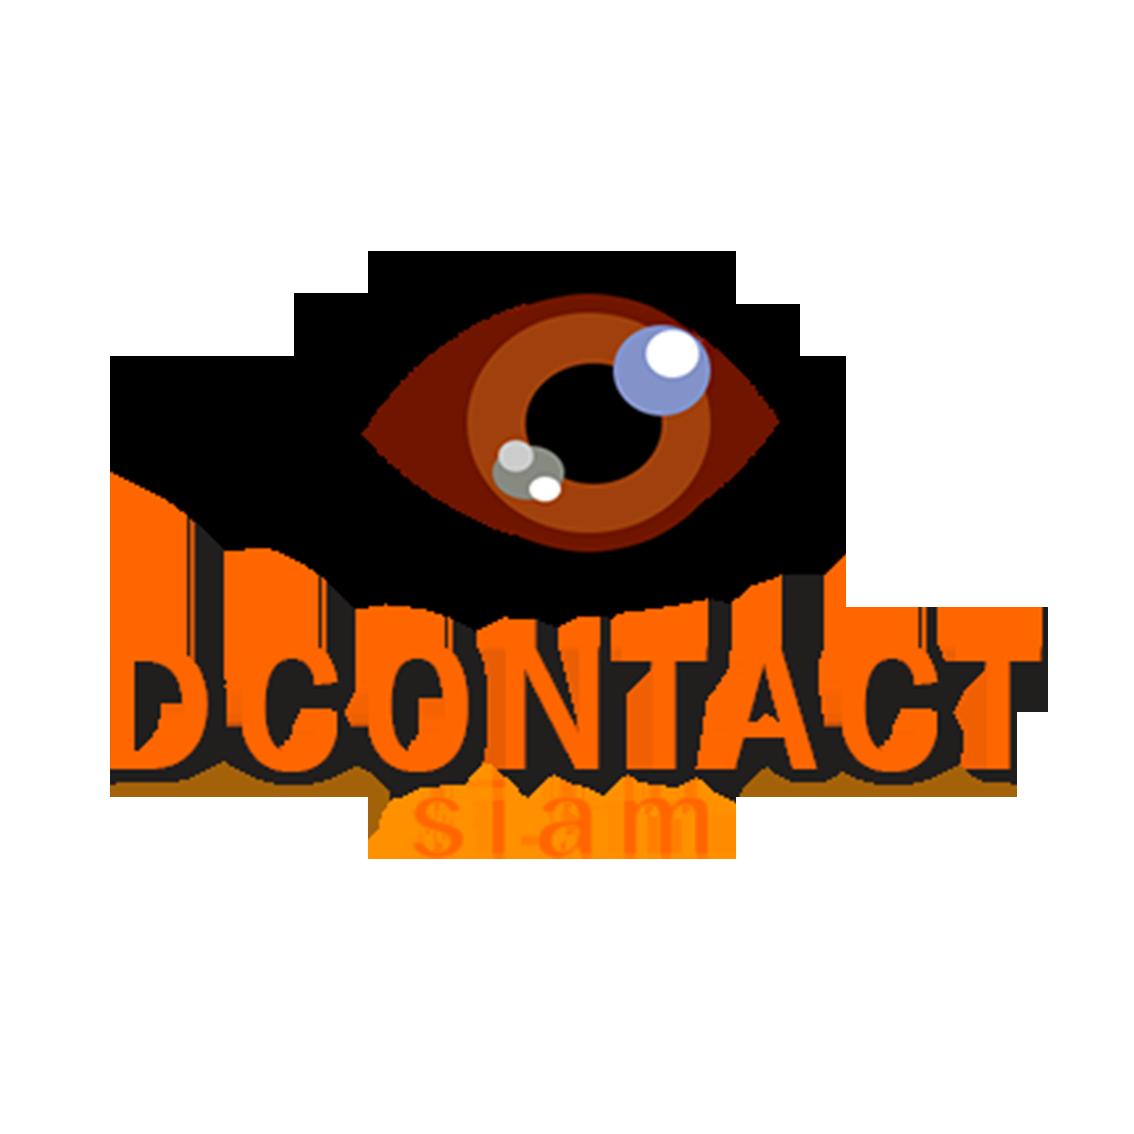 www.dcontactsiam2.com